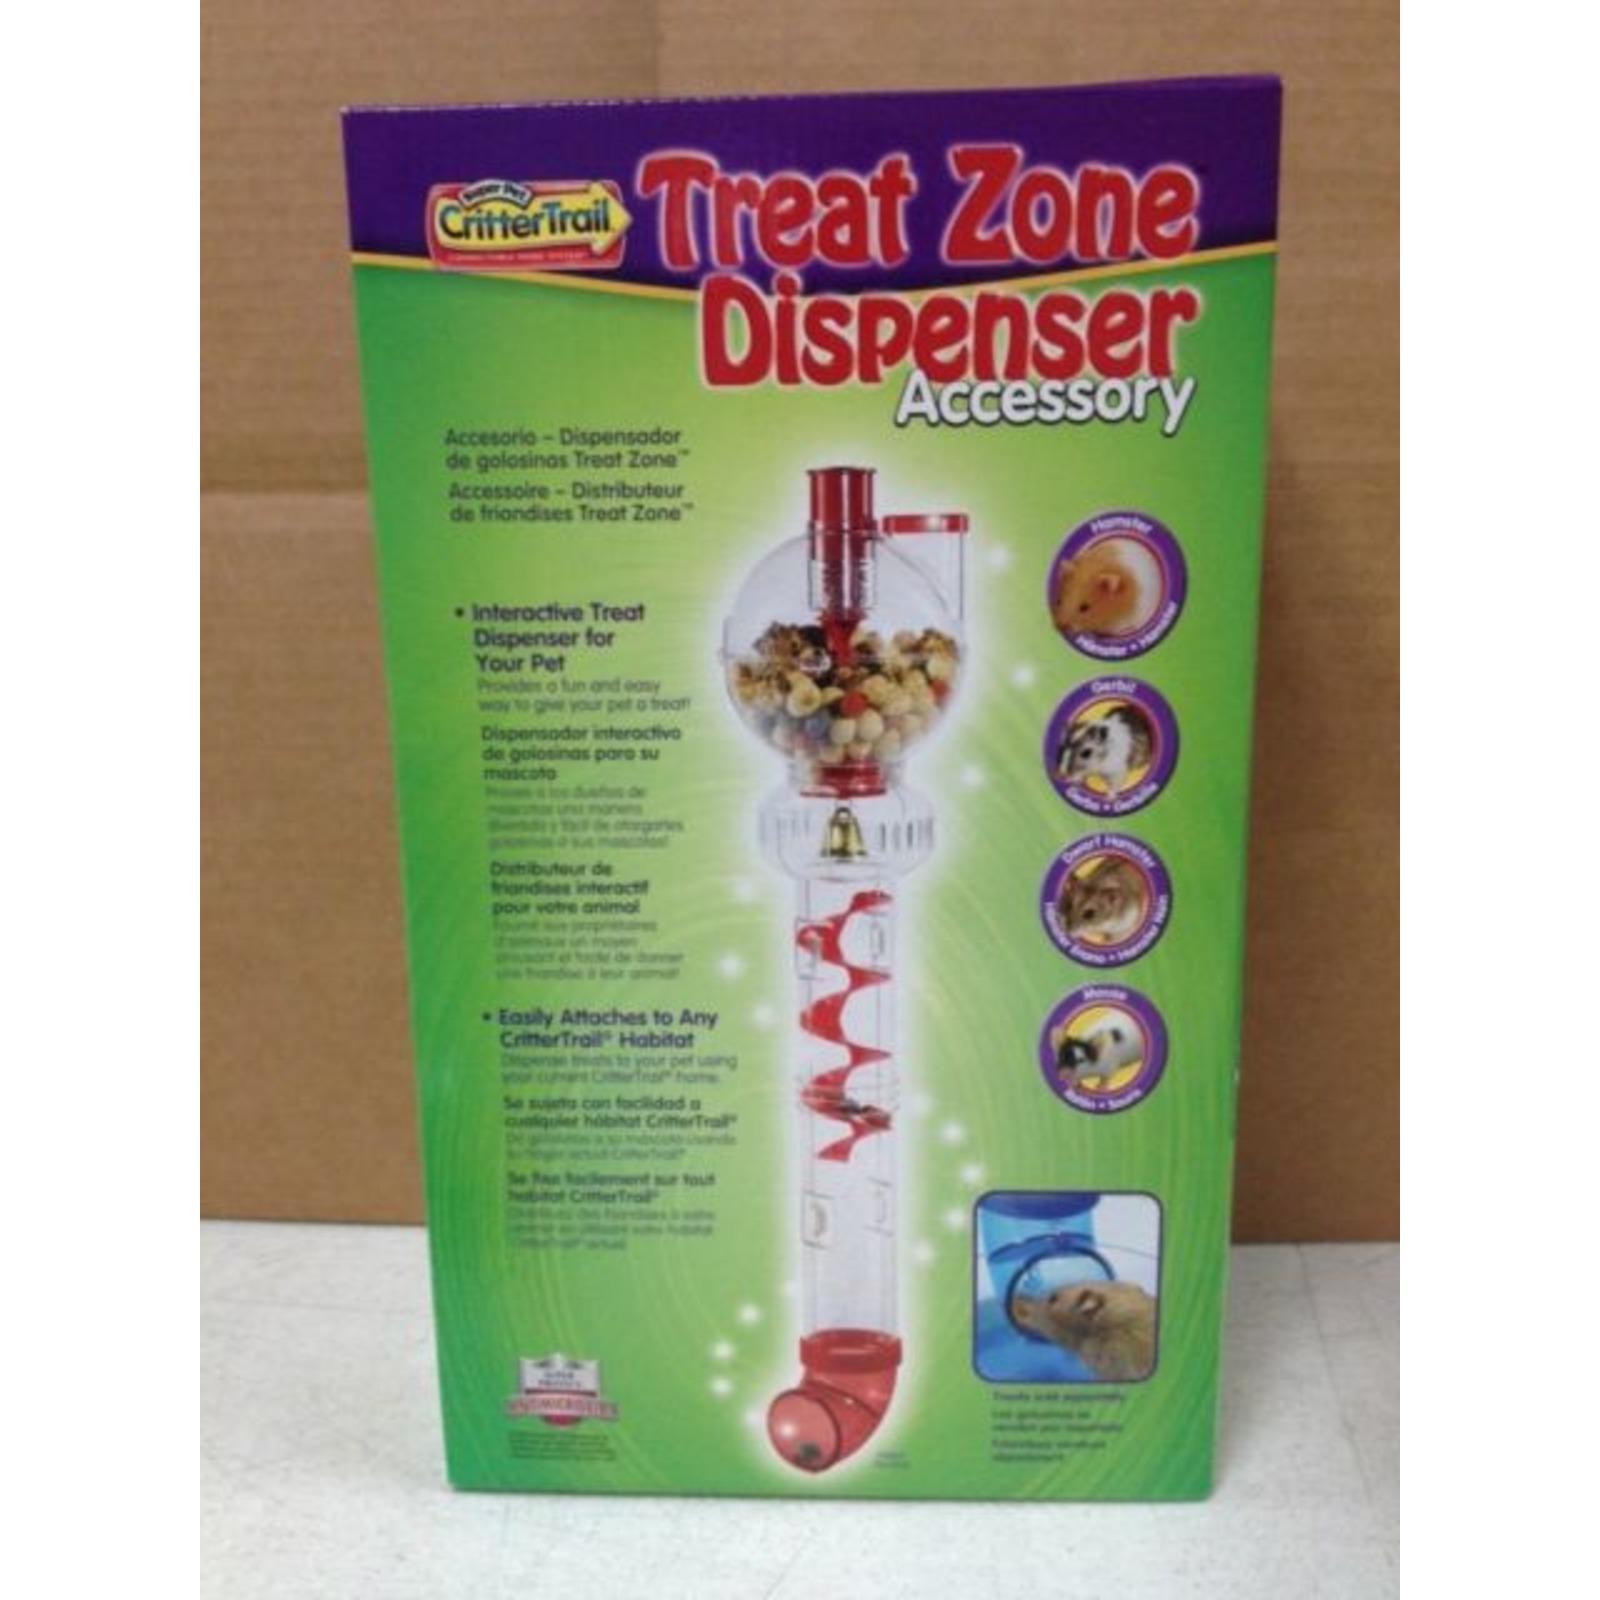 Super Pet Crittertrail Treat Zone Dispenser